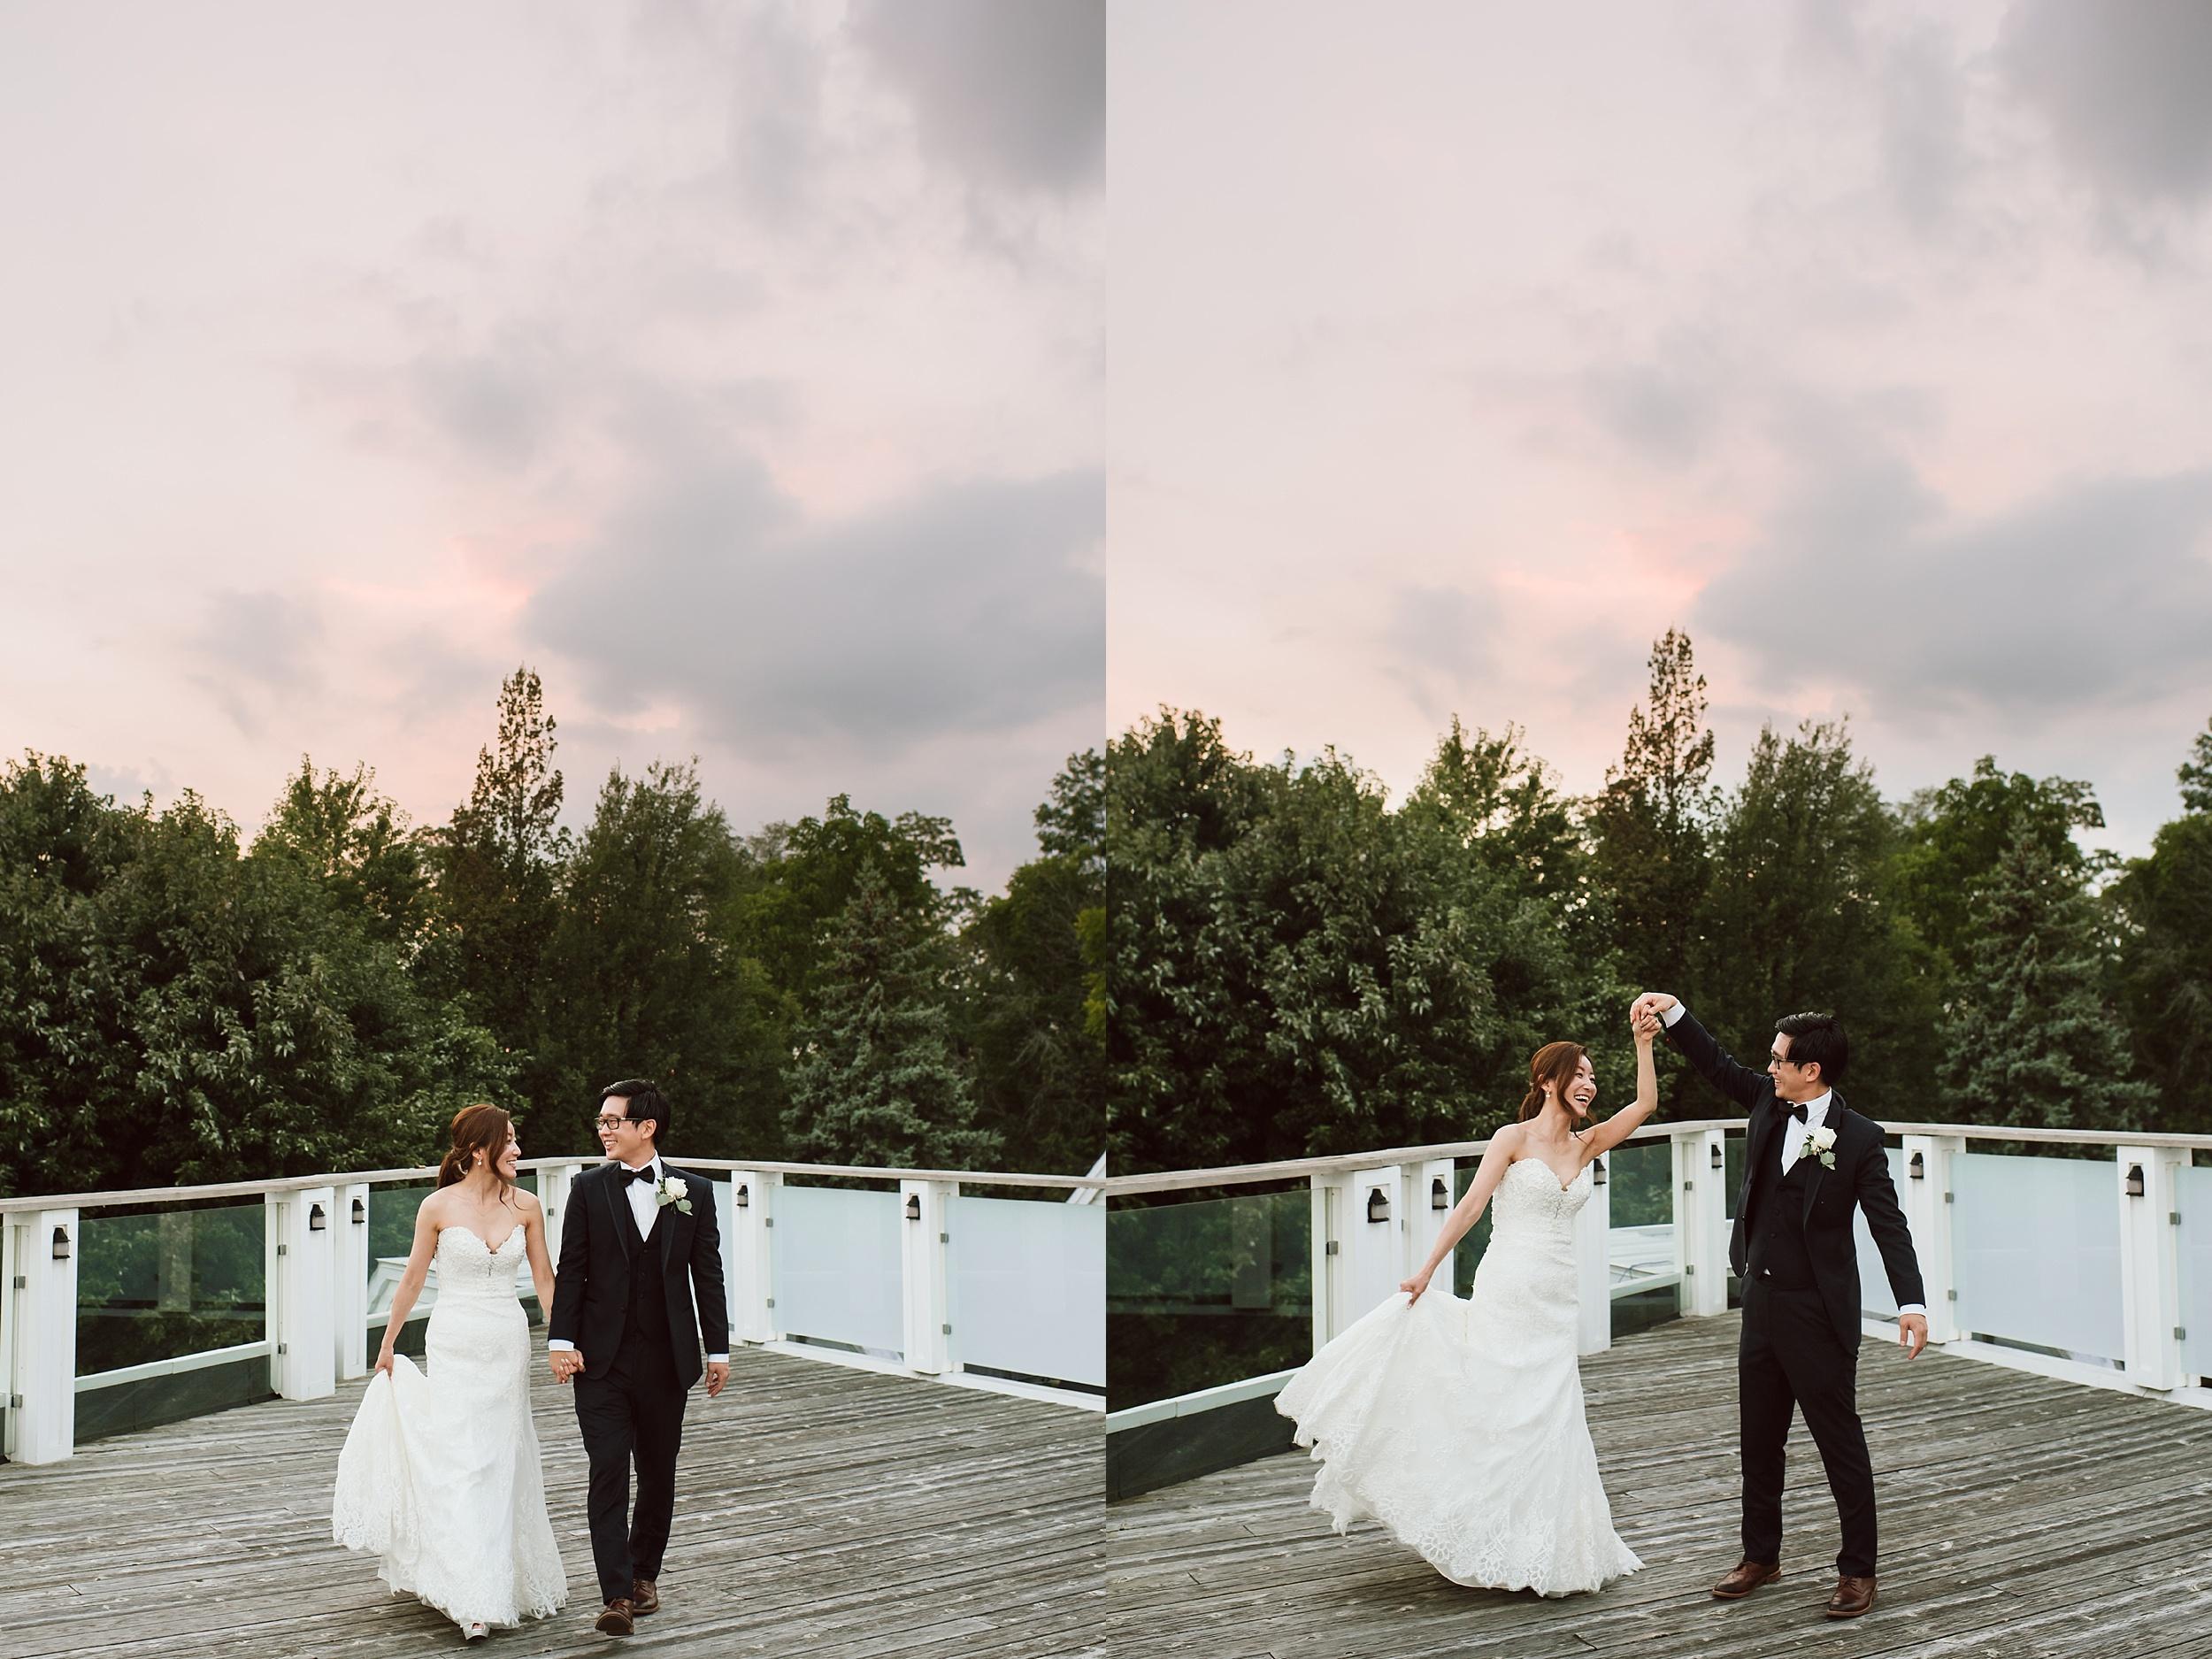 Doctors_House_Kleinburg_Wedding_Toronto_Photographer_0057.jpg